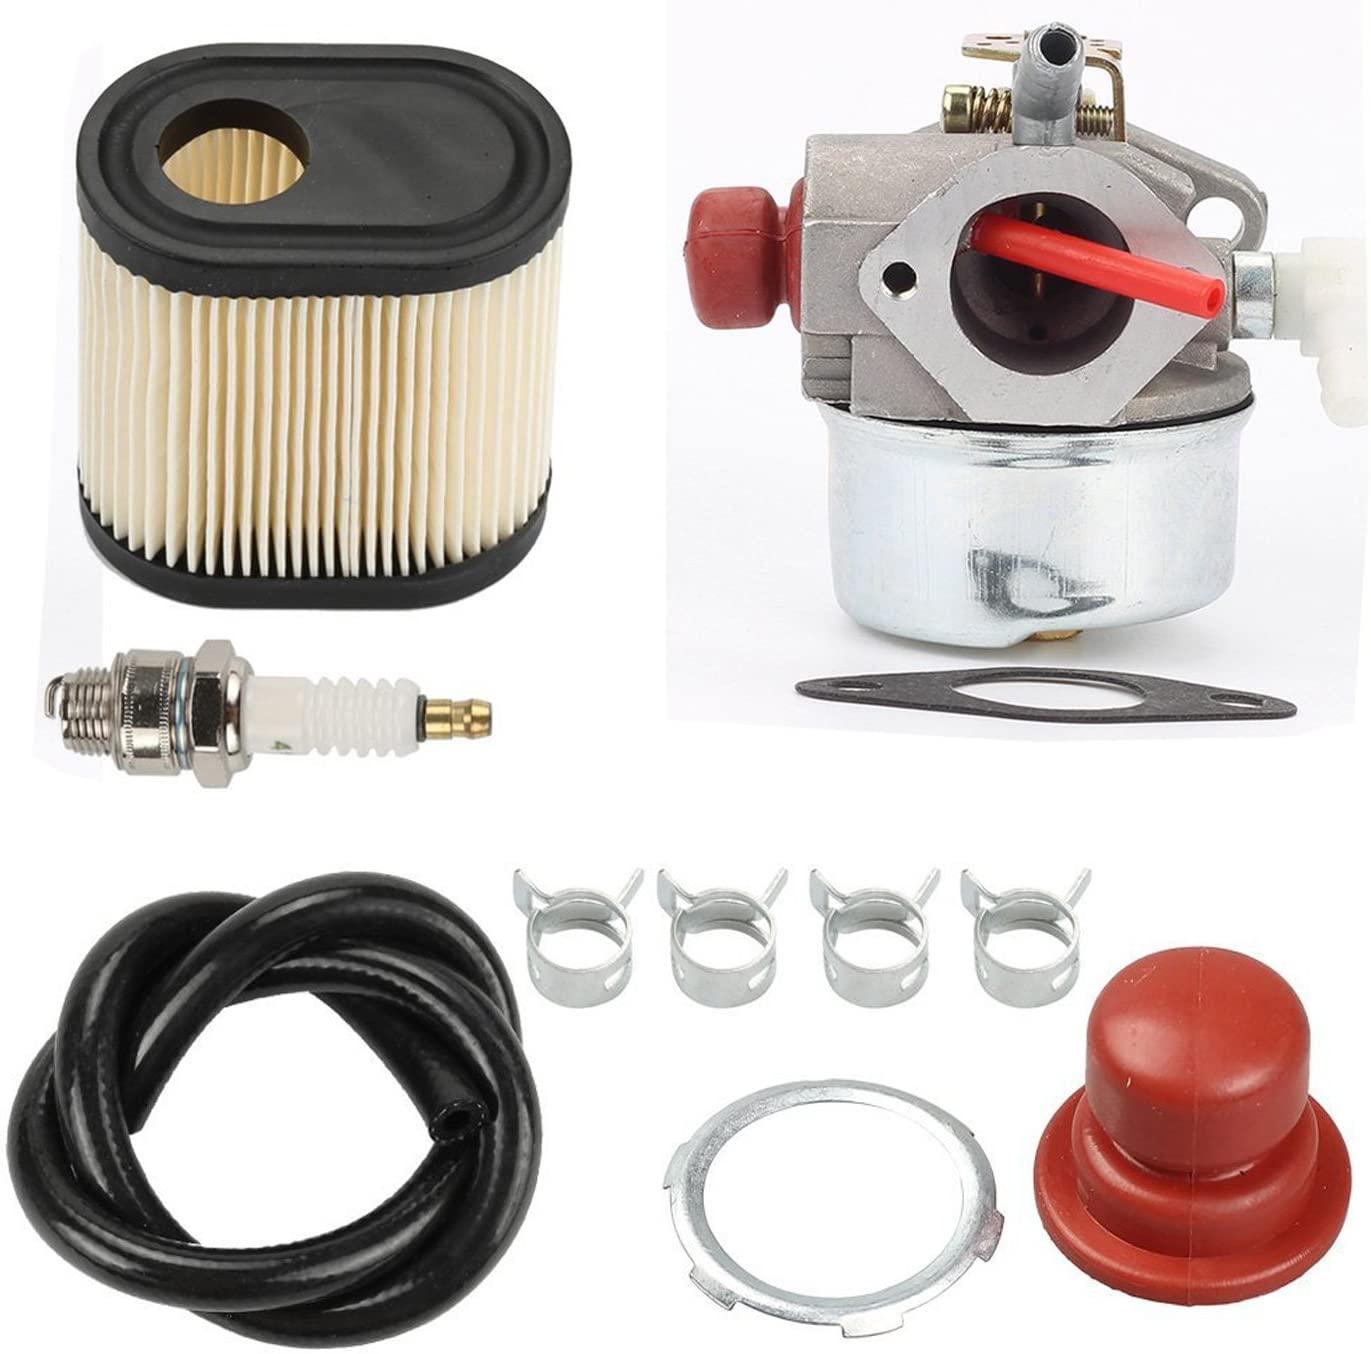 HIFROM Carburetor with 36905 Air Filter Spark Plug & Gasket for Tecumseh LEV100 LEV105 LEV120 LV195EA LV195XA Toro Recycler Lawnmowers 20016 20017 20018 6 6.25 6.5 6.75 HP Engines